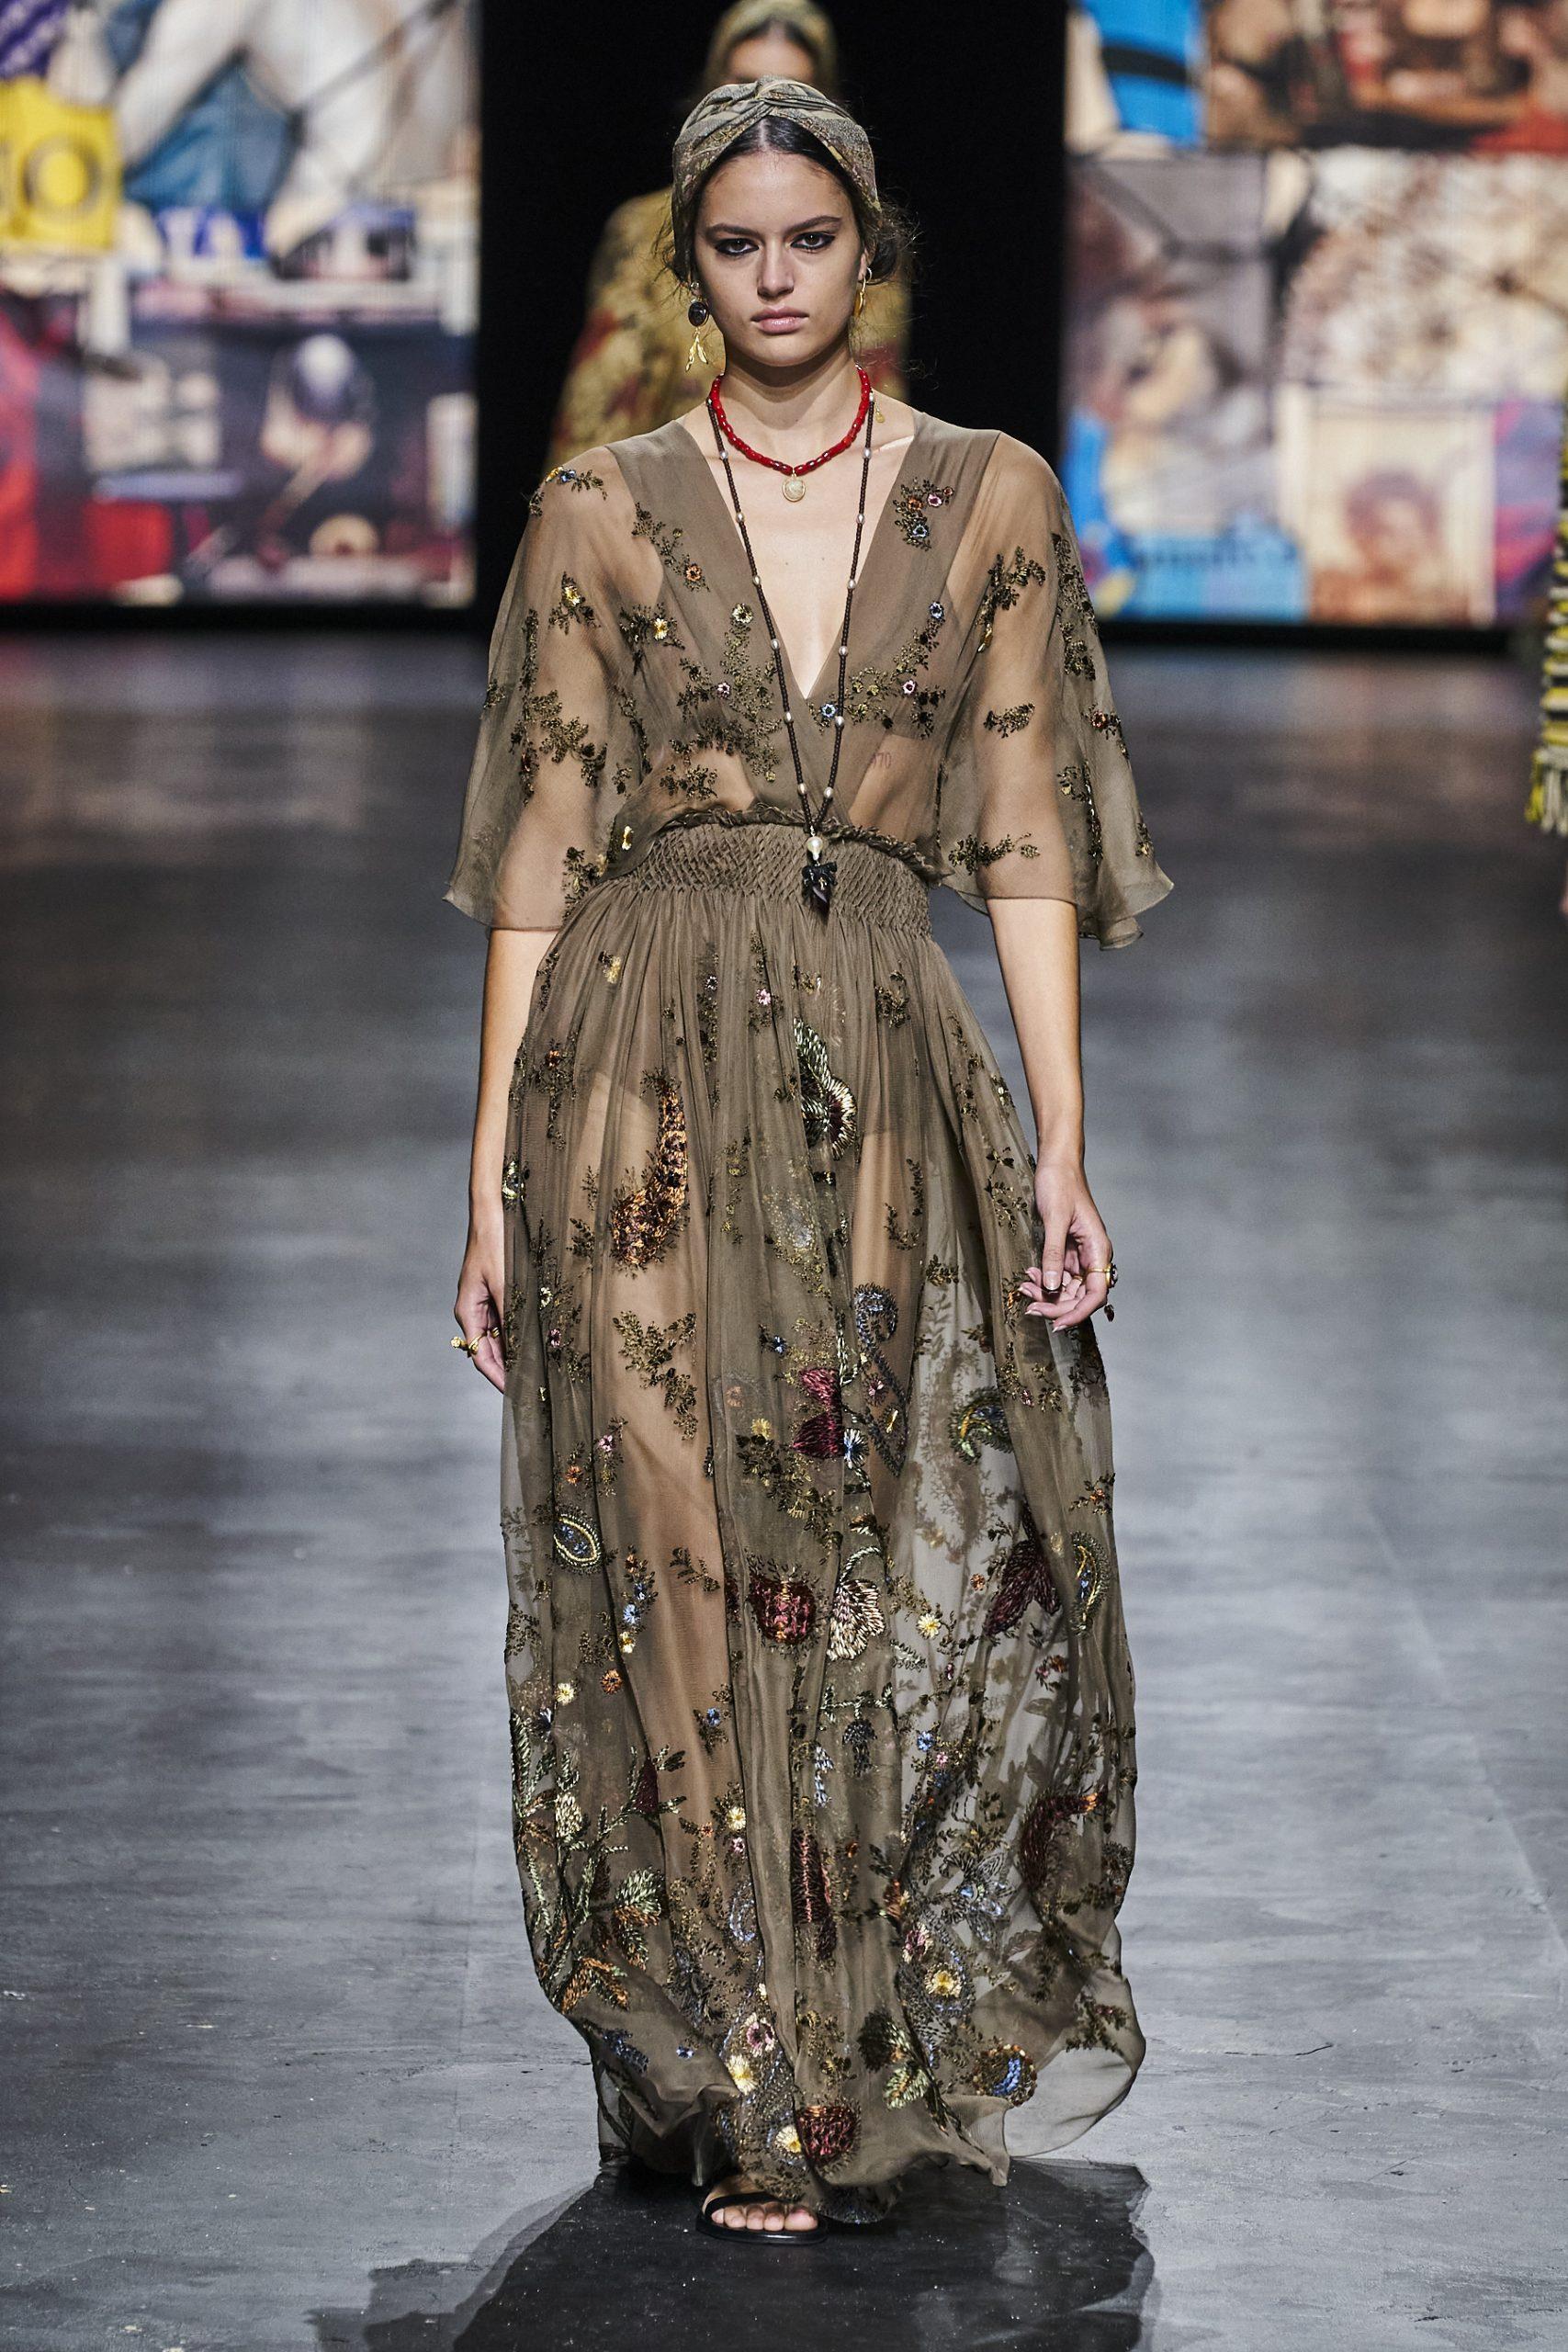 Top 12 Spring 2021 Women's Fashion Shows